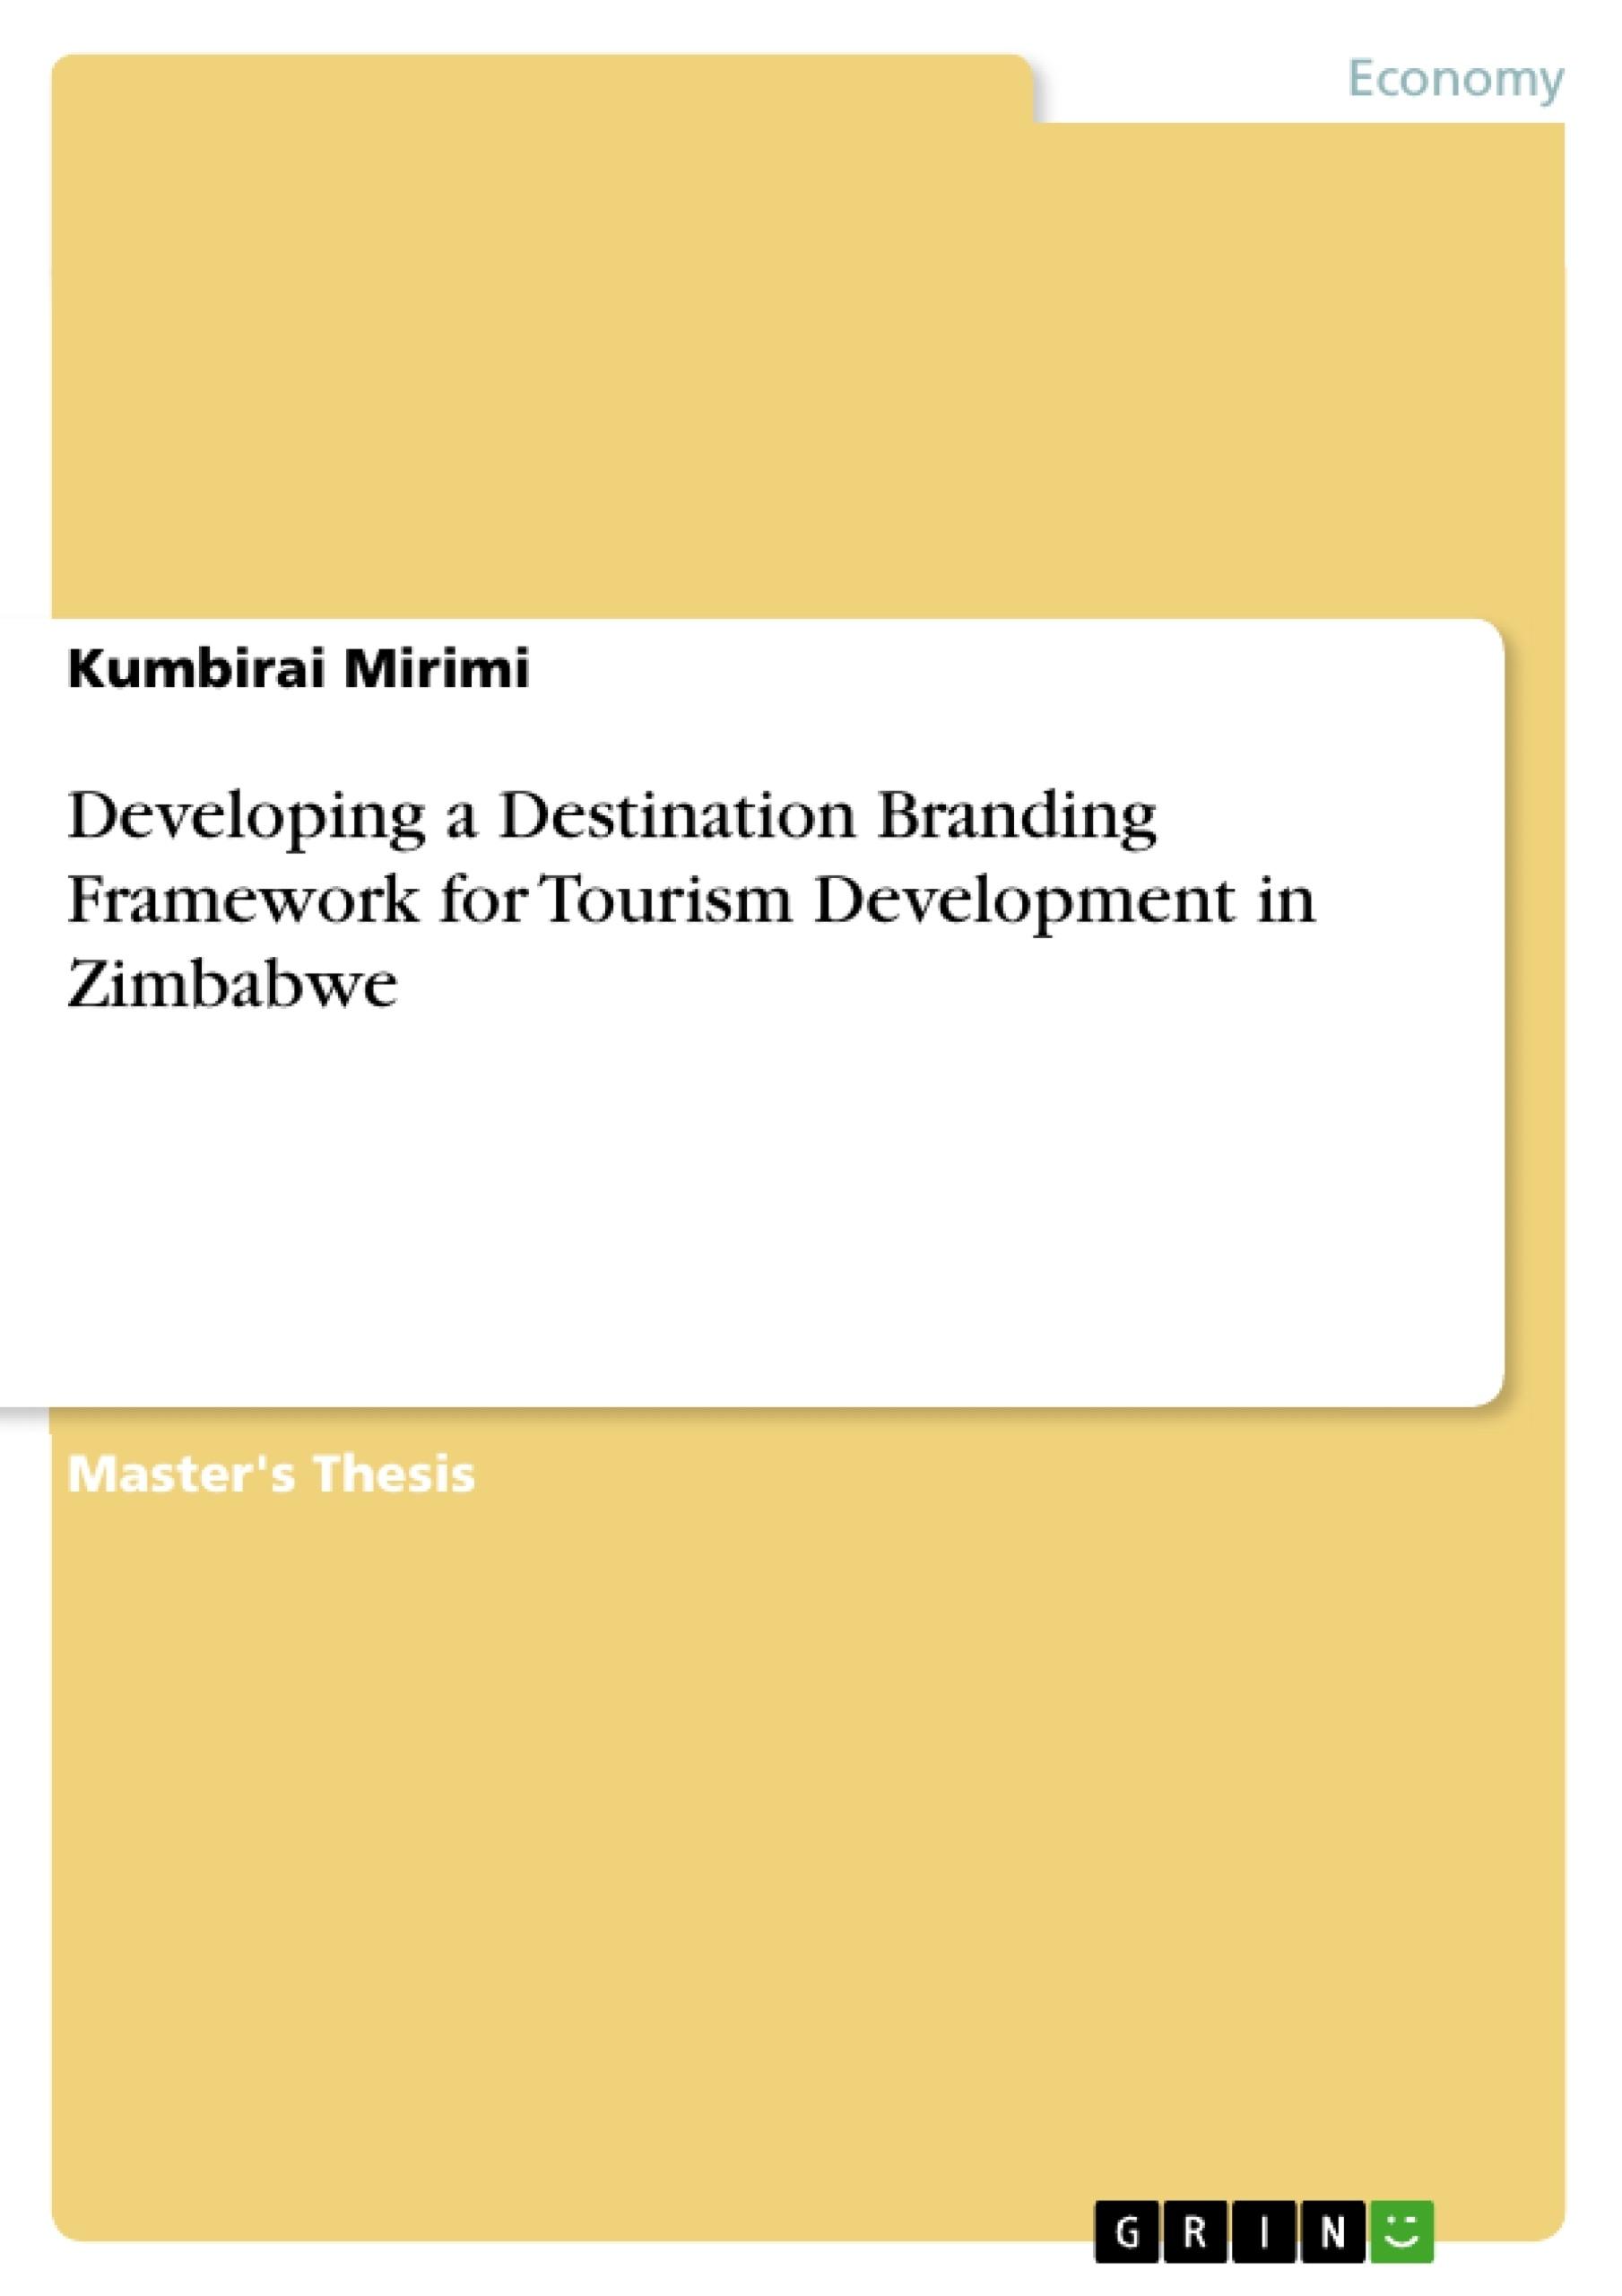 Title: Developing a Destination Branding Framework for Tourism Development in Zimbabwe